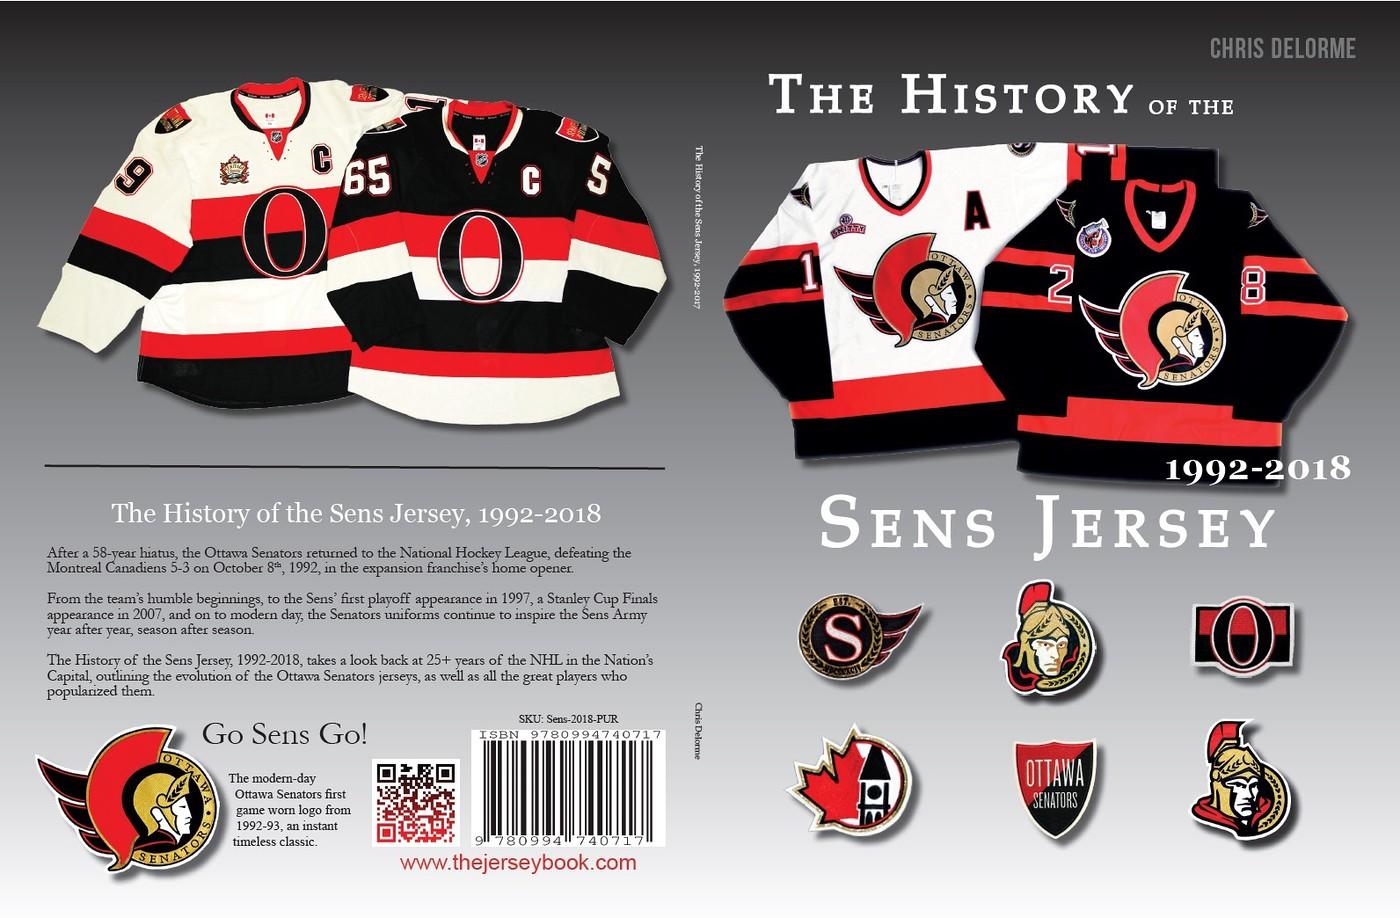 Game Worn Ottawa Senators Jerseys